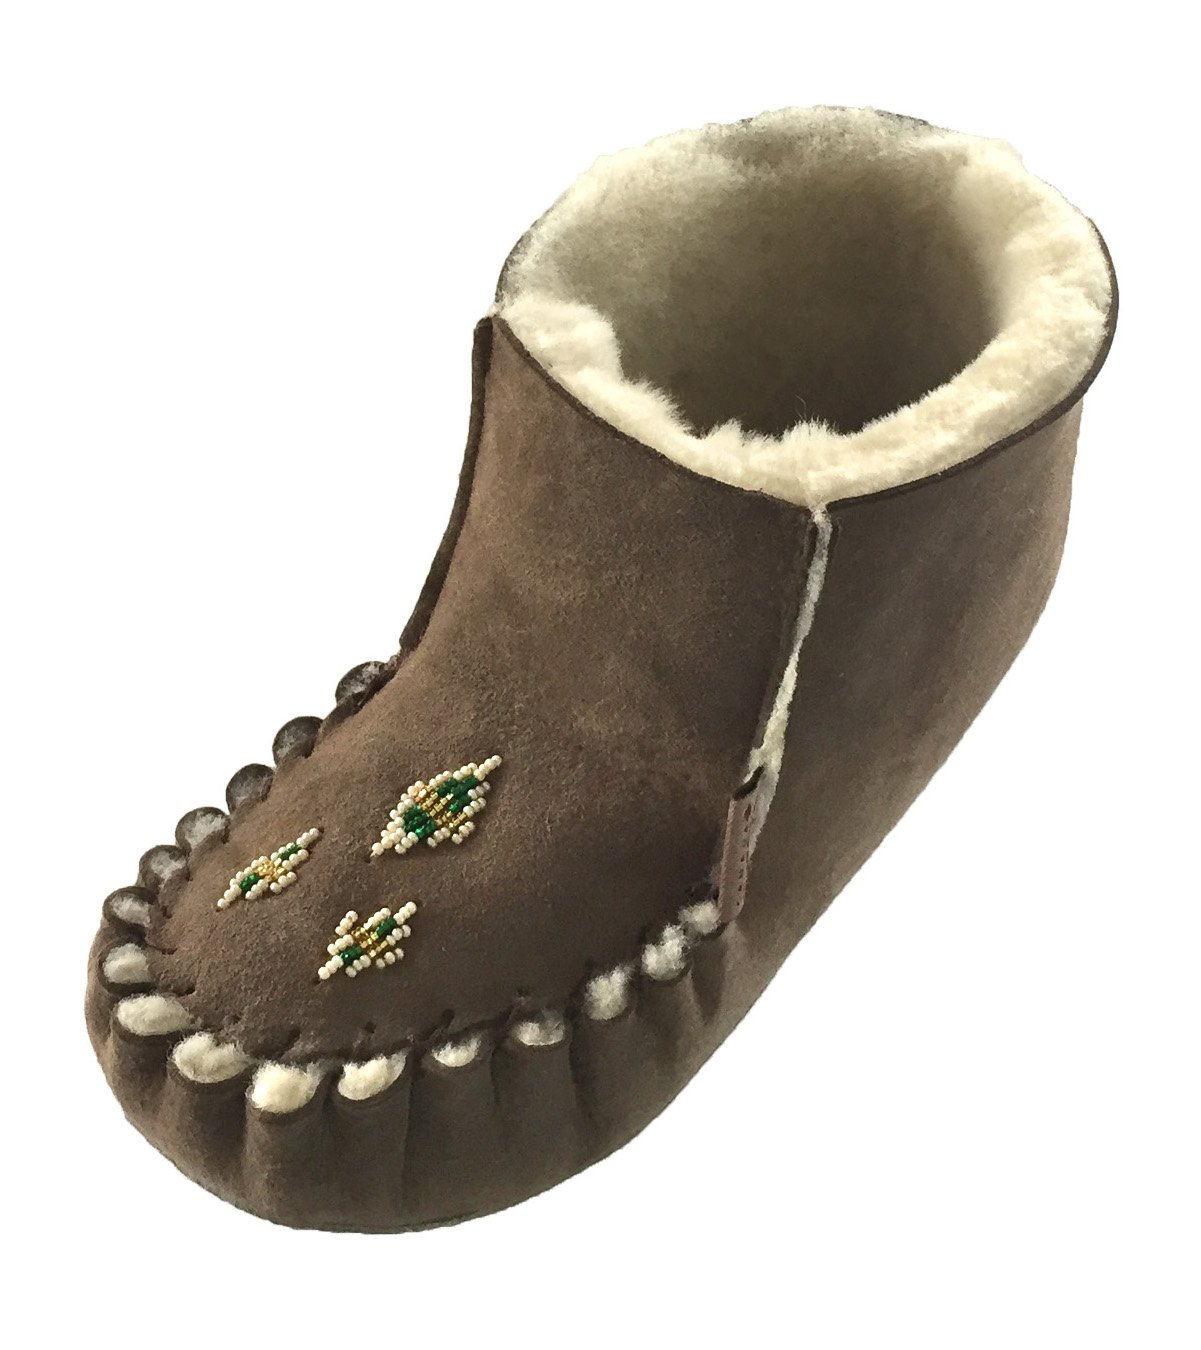 Laurentian Chief Women's Bootie Sheepskin Moccasins size 9